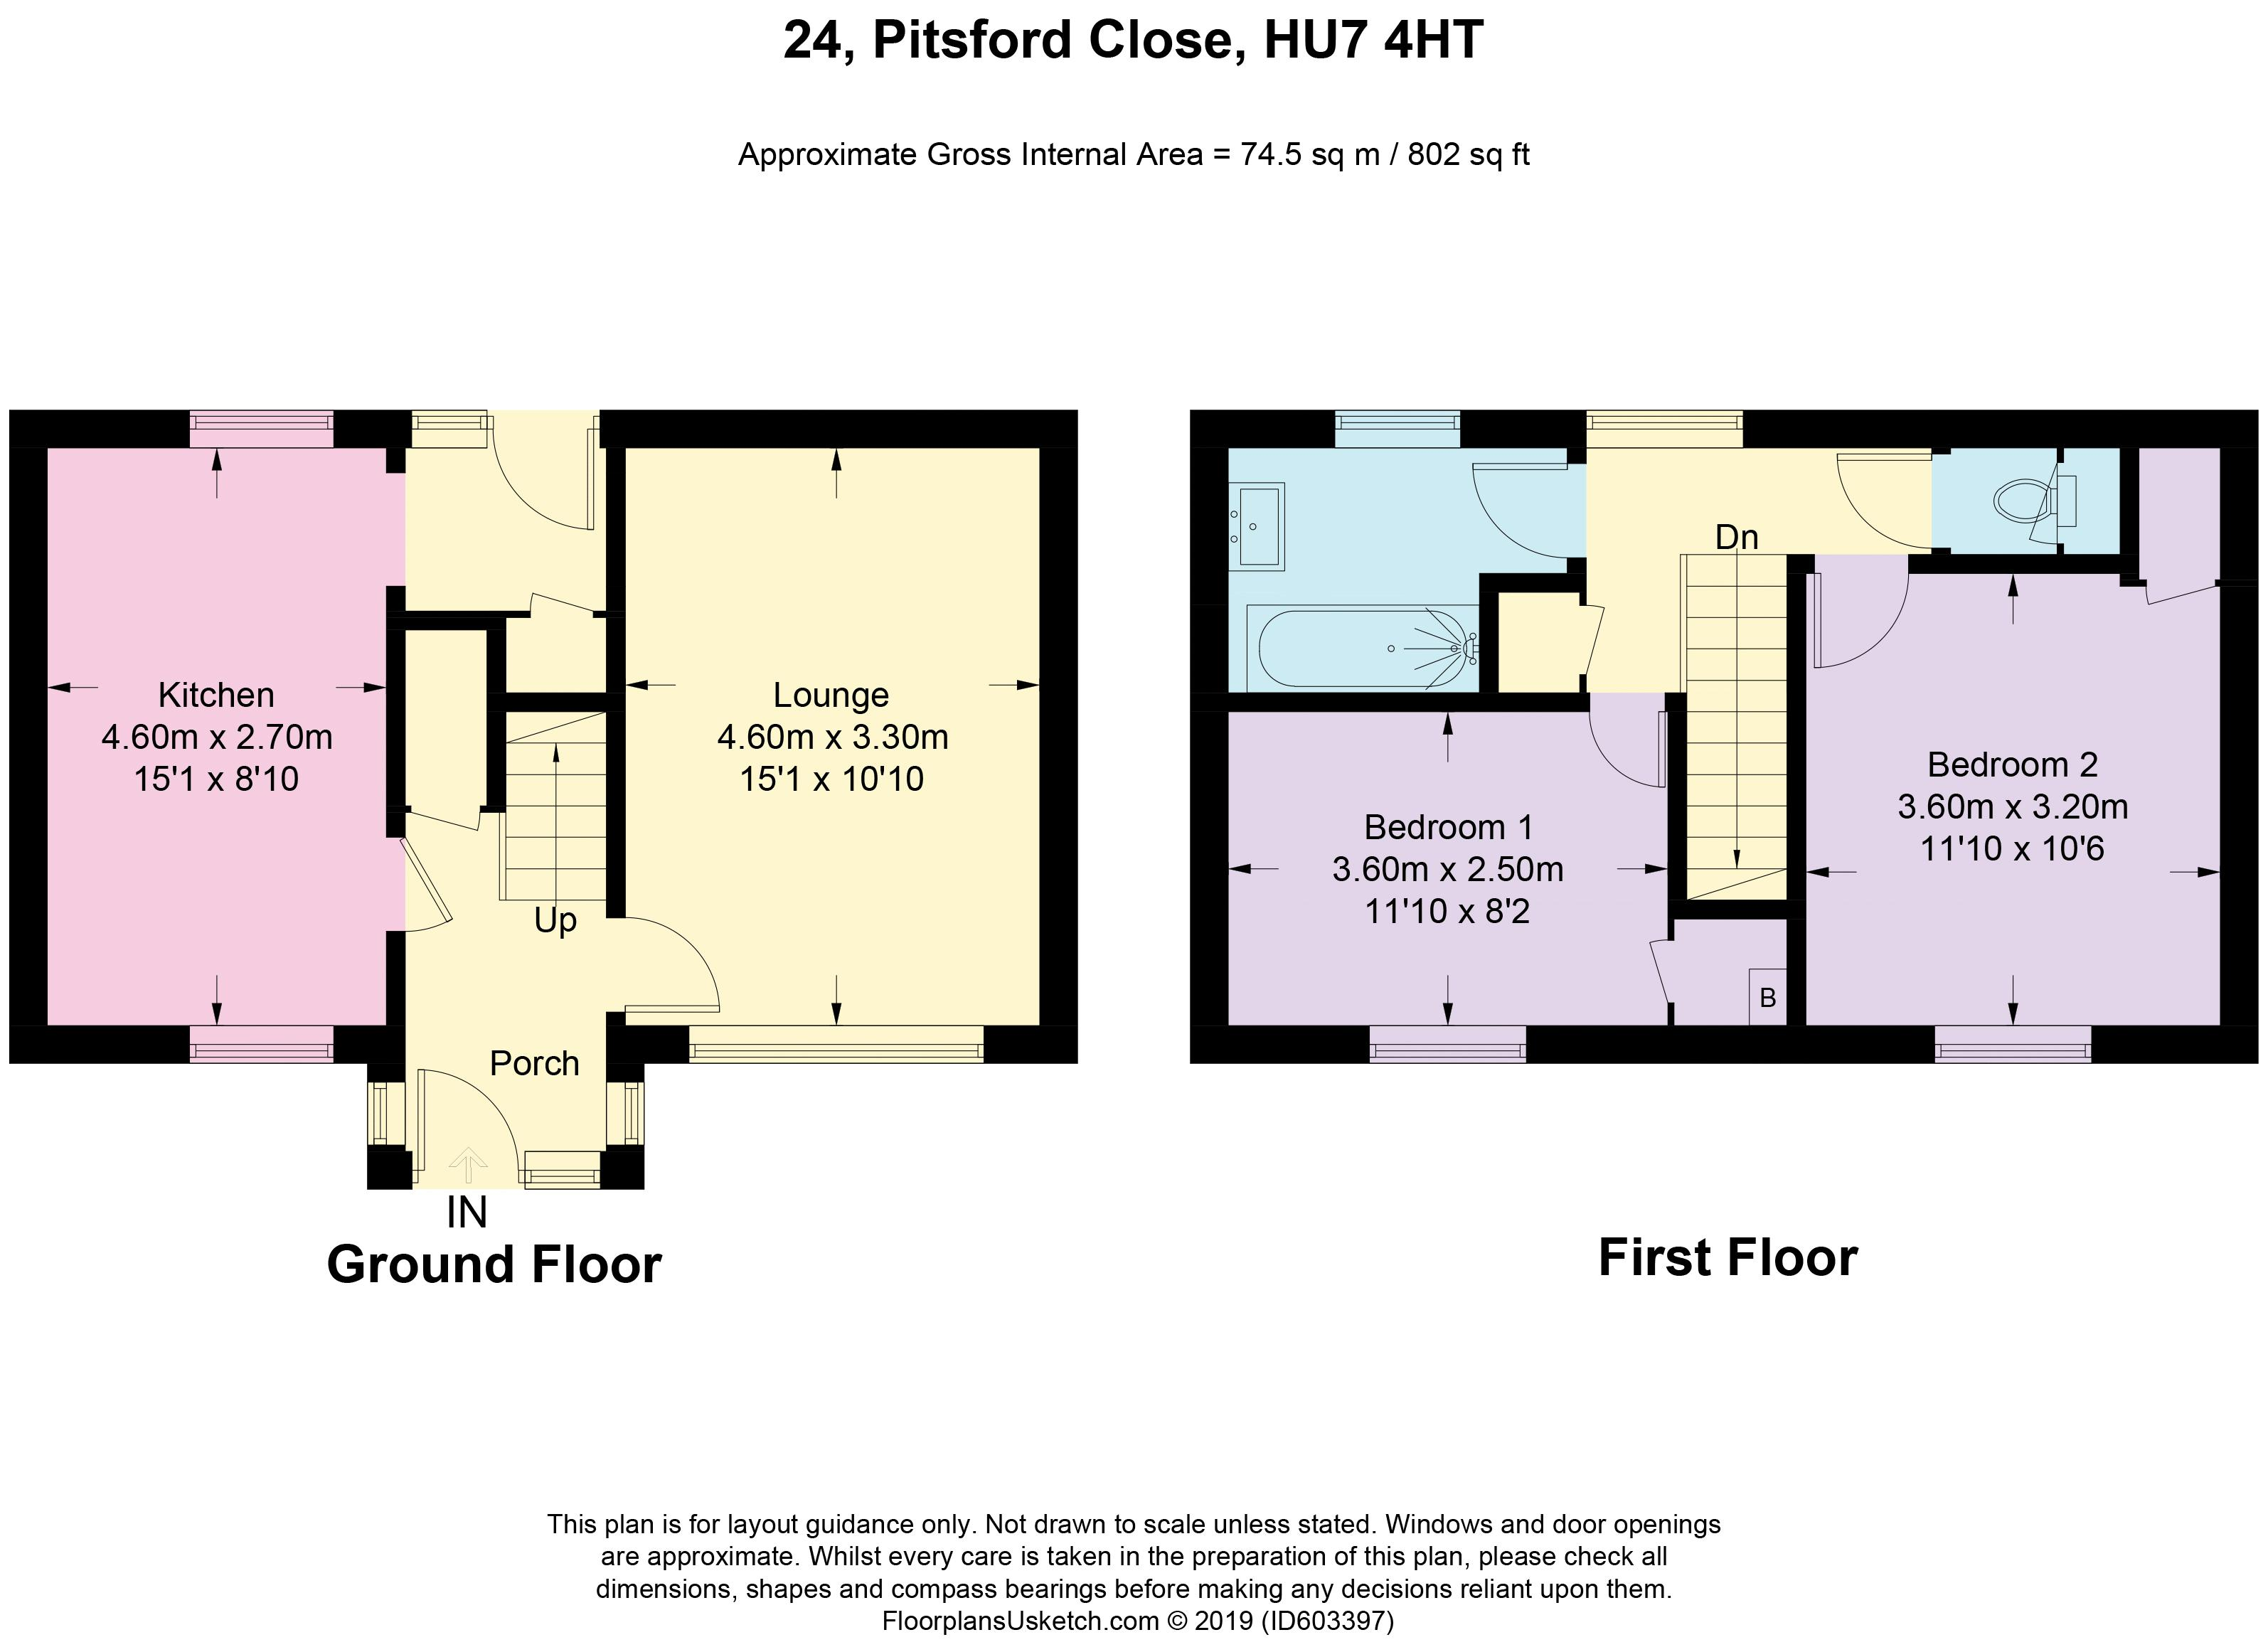 Pitsford Close - Floorplan